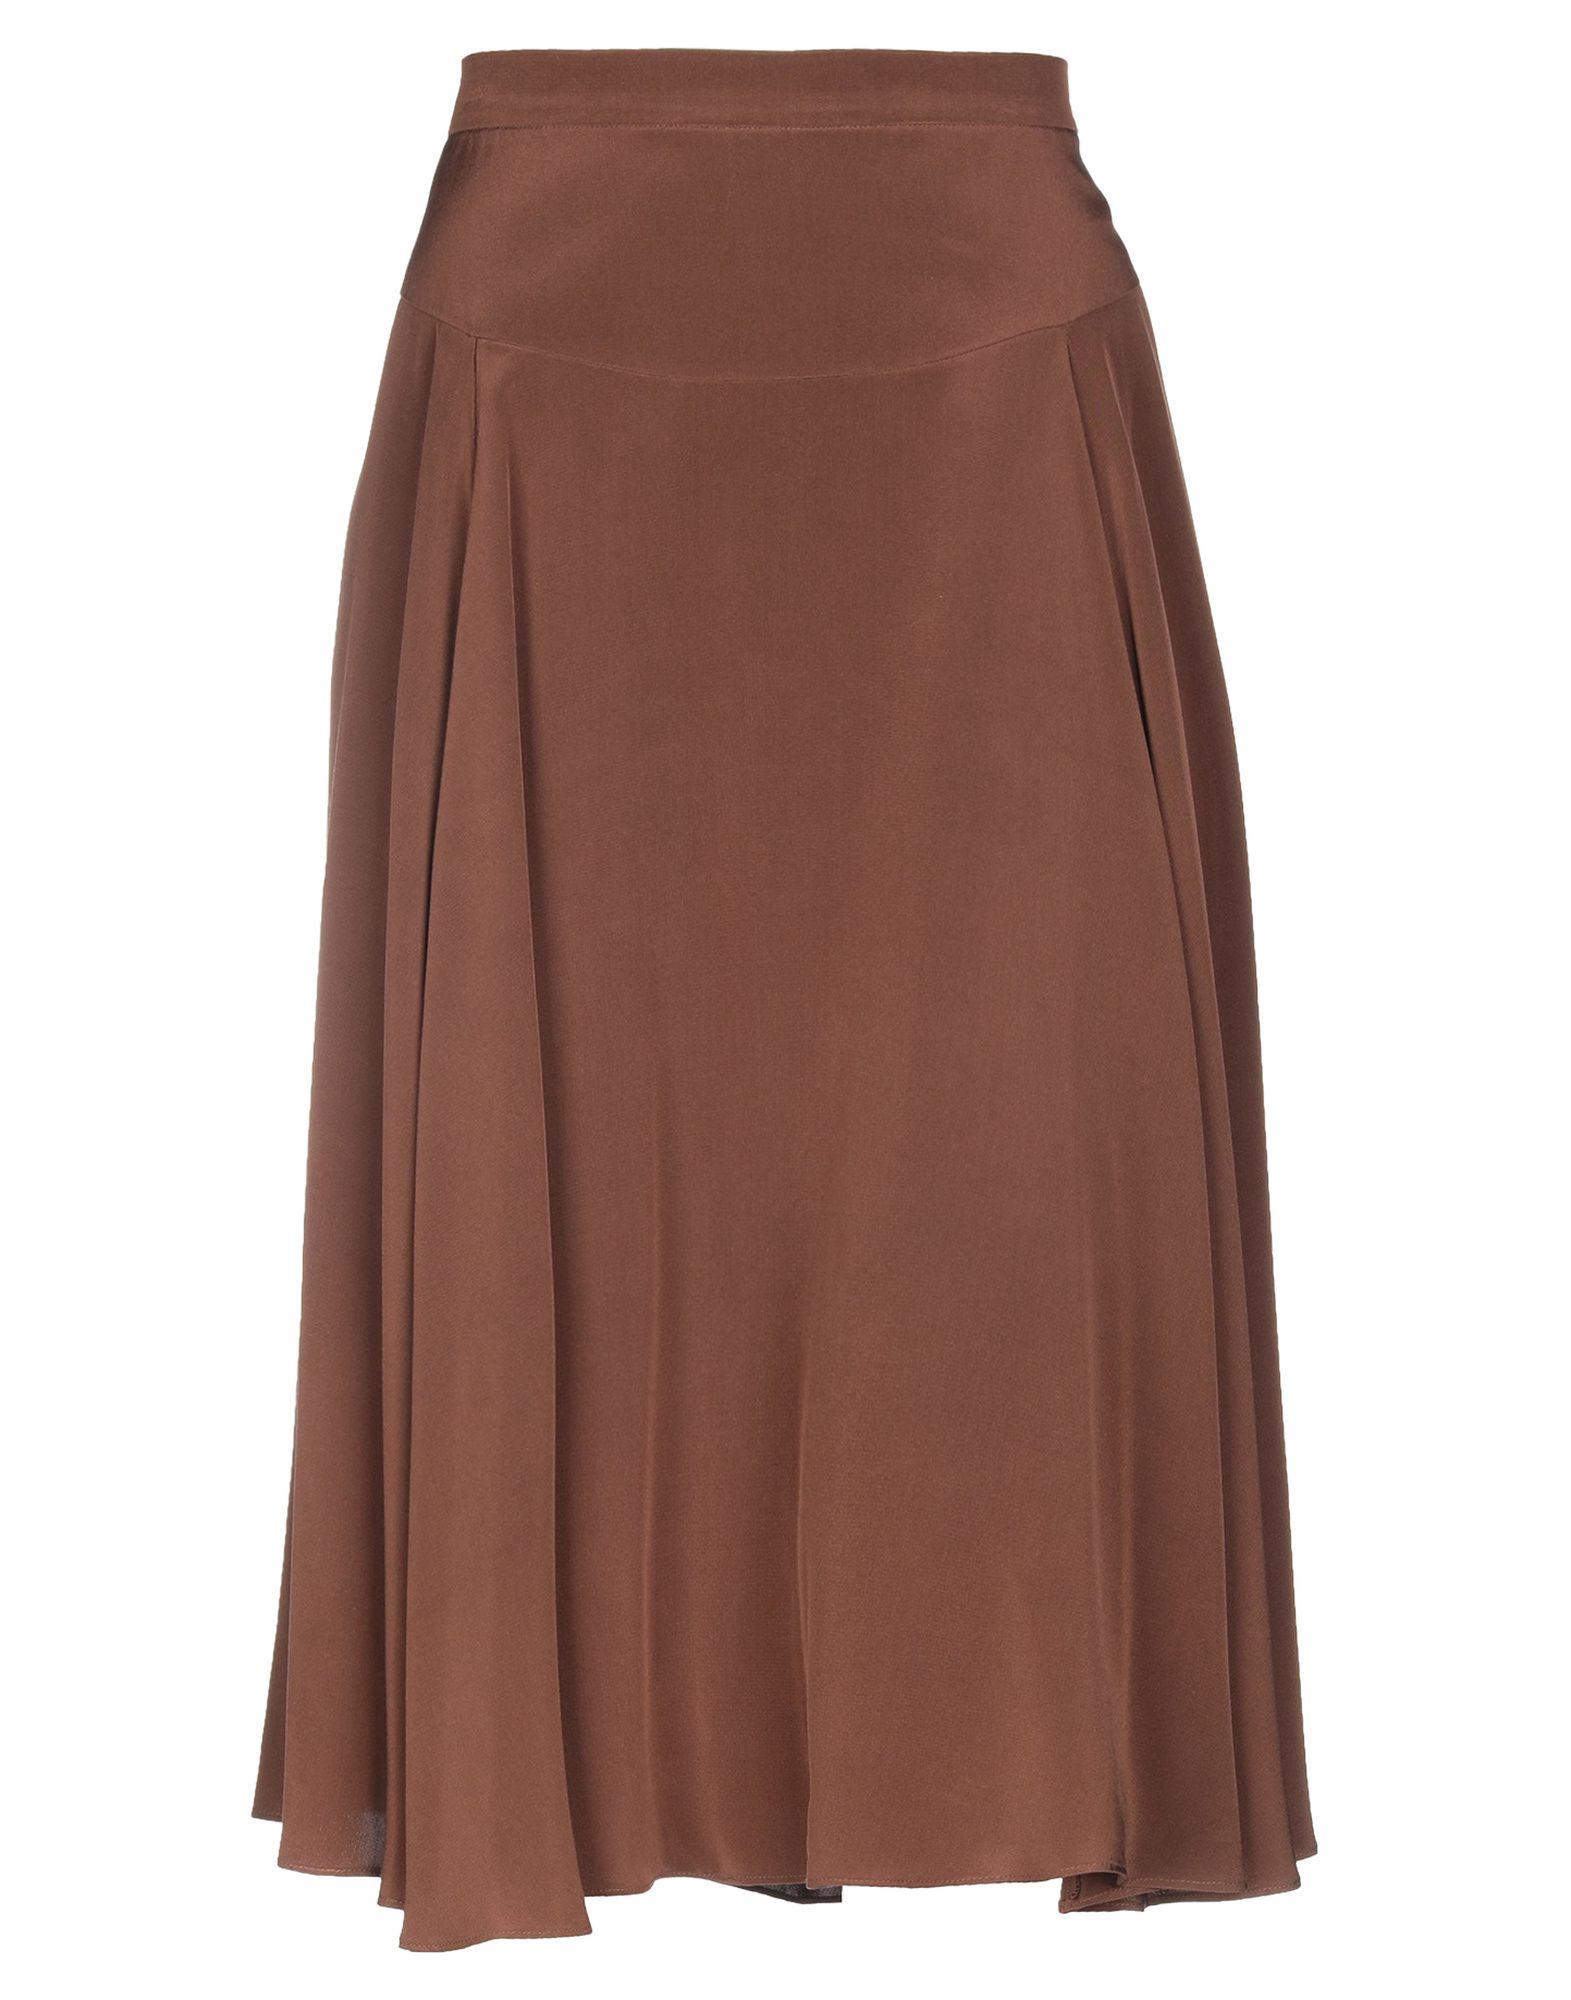 MARC BY MARC JACOBS Юбка длиной 3/4 marc jacobs платье длиной 3 4